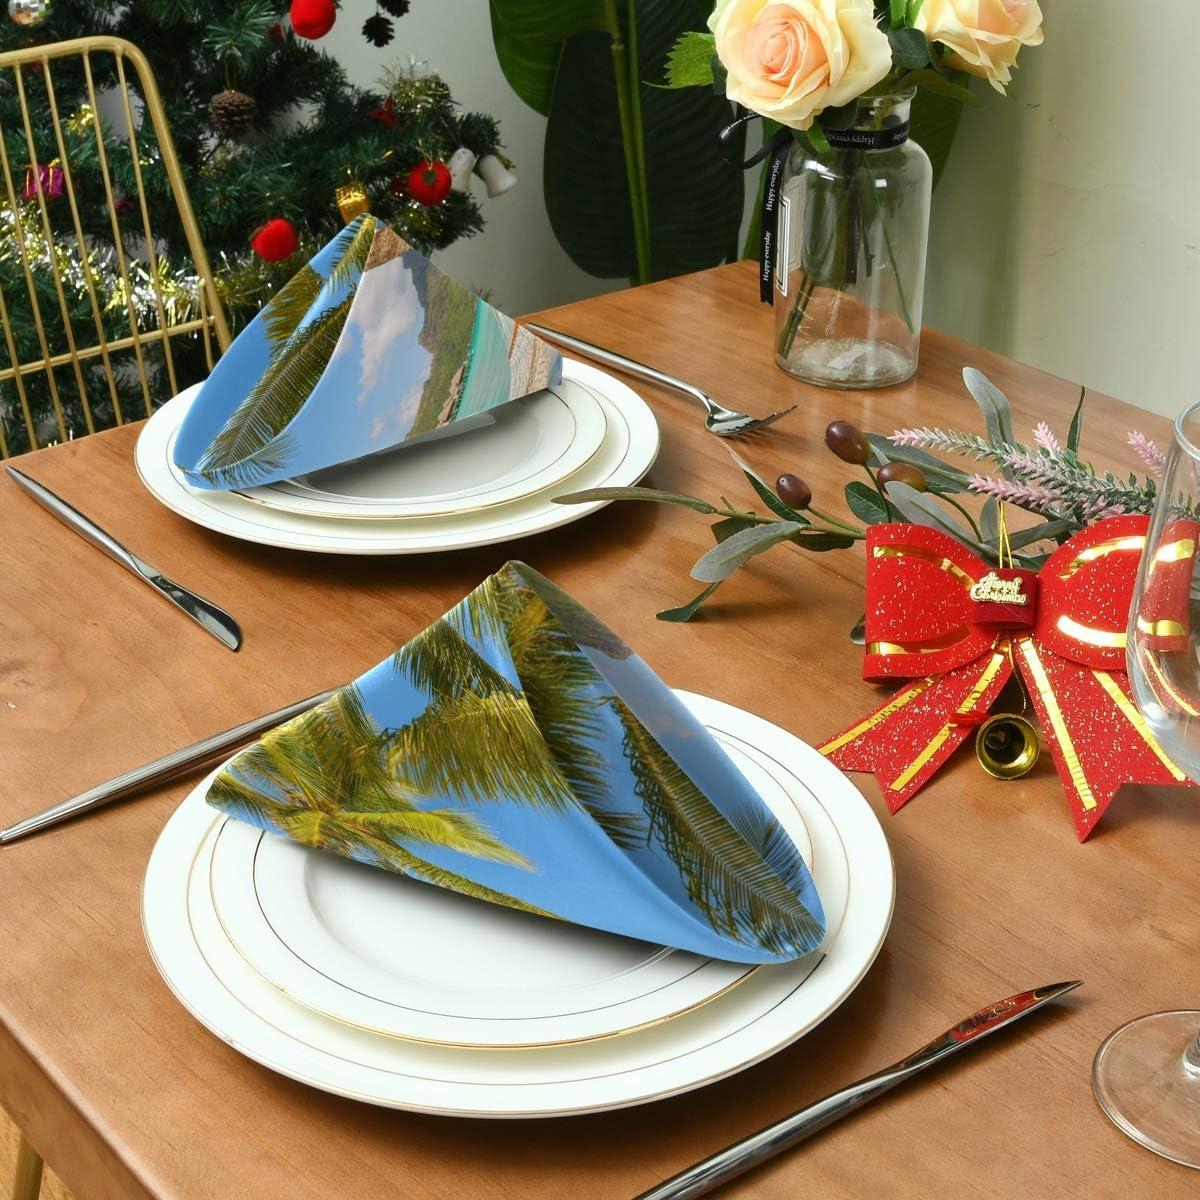 Lerous Napkins Palm Leaves Beach Party Wedding Luncheon Birthday Home Decor Soft Cloth Napkin 20x20 Inch Set of 1